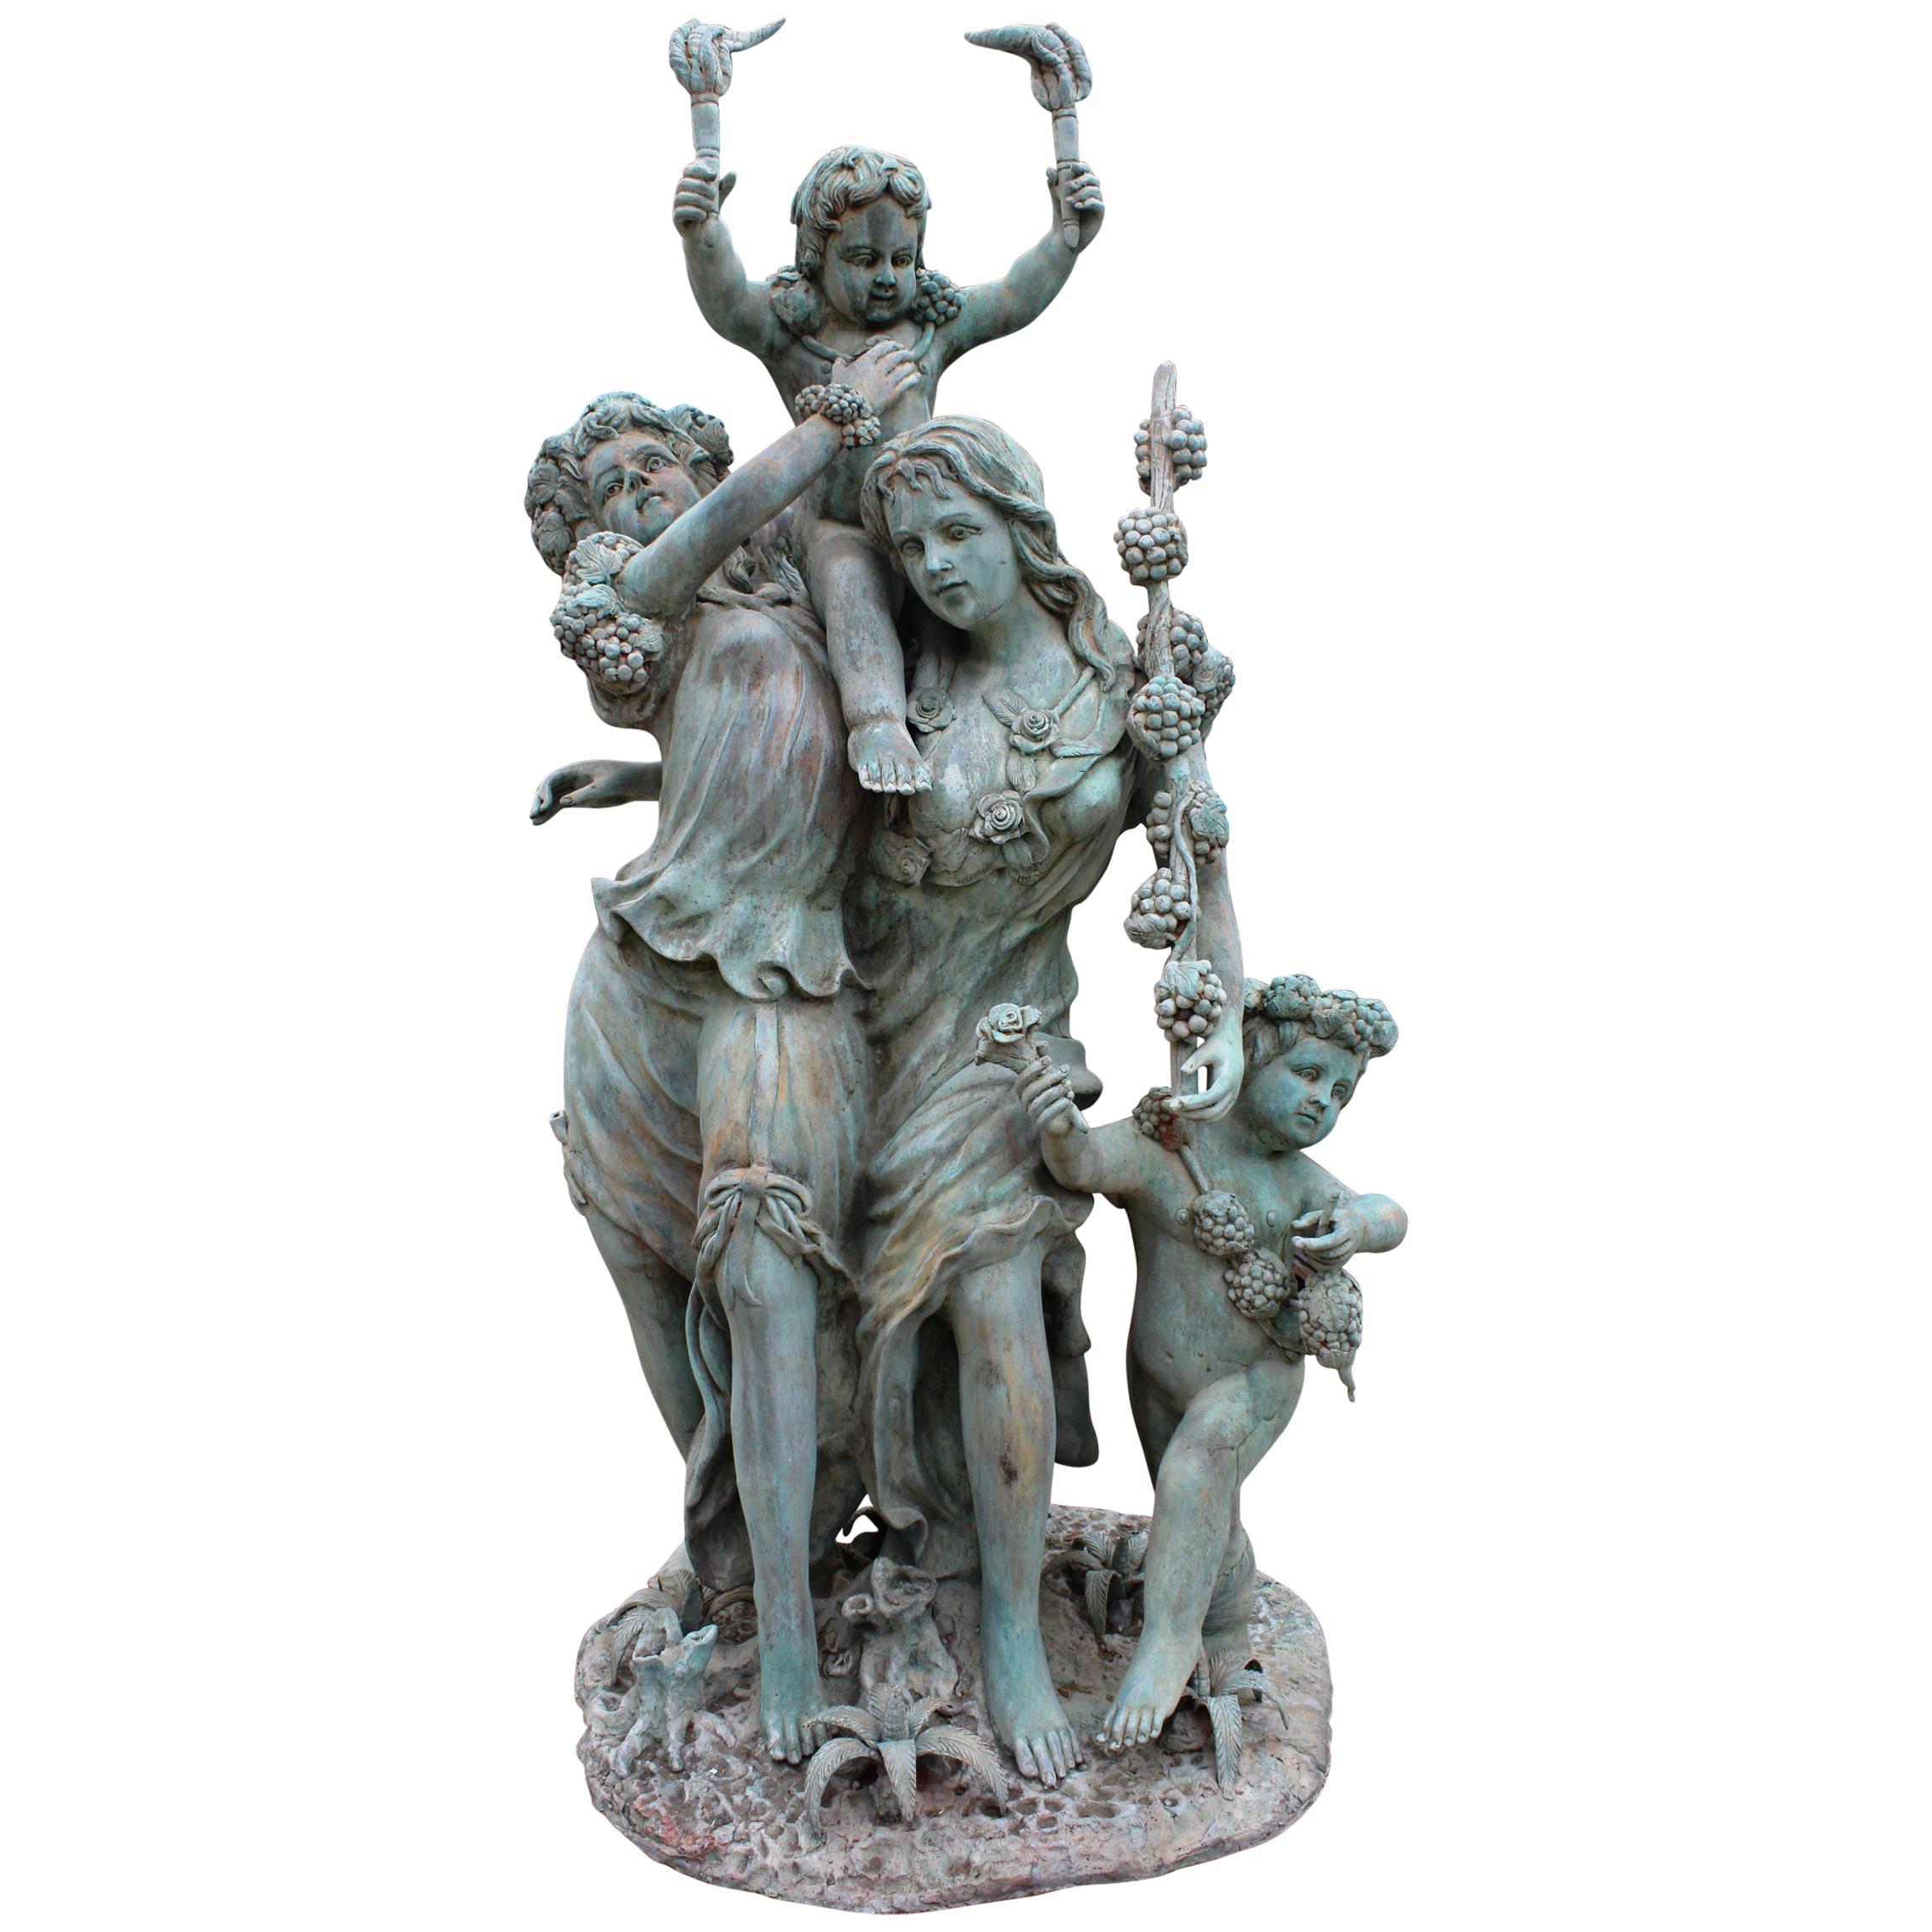 Life-Size Bronze Sculptures of Two Ladies with Cherubs